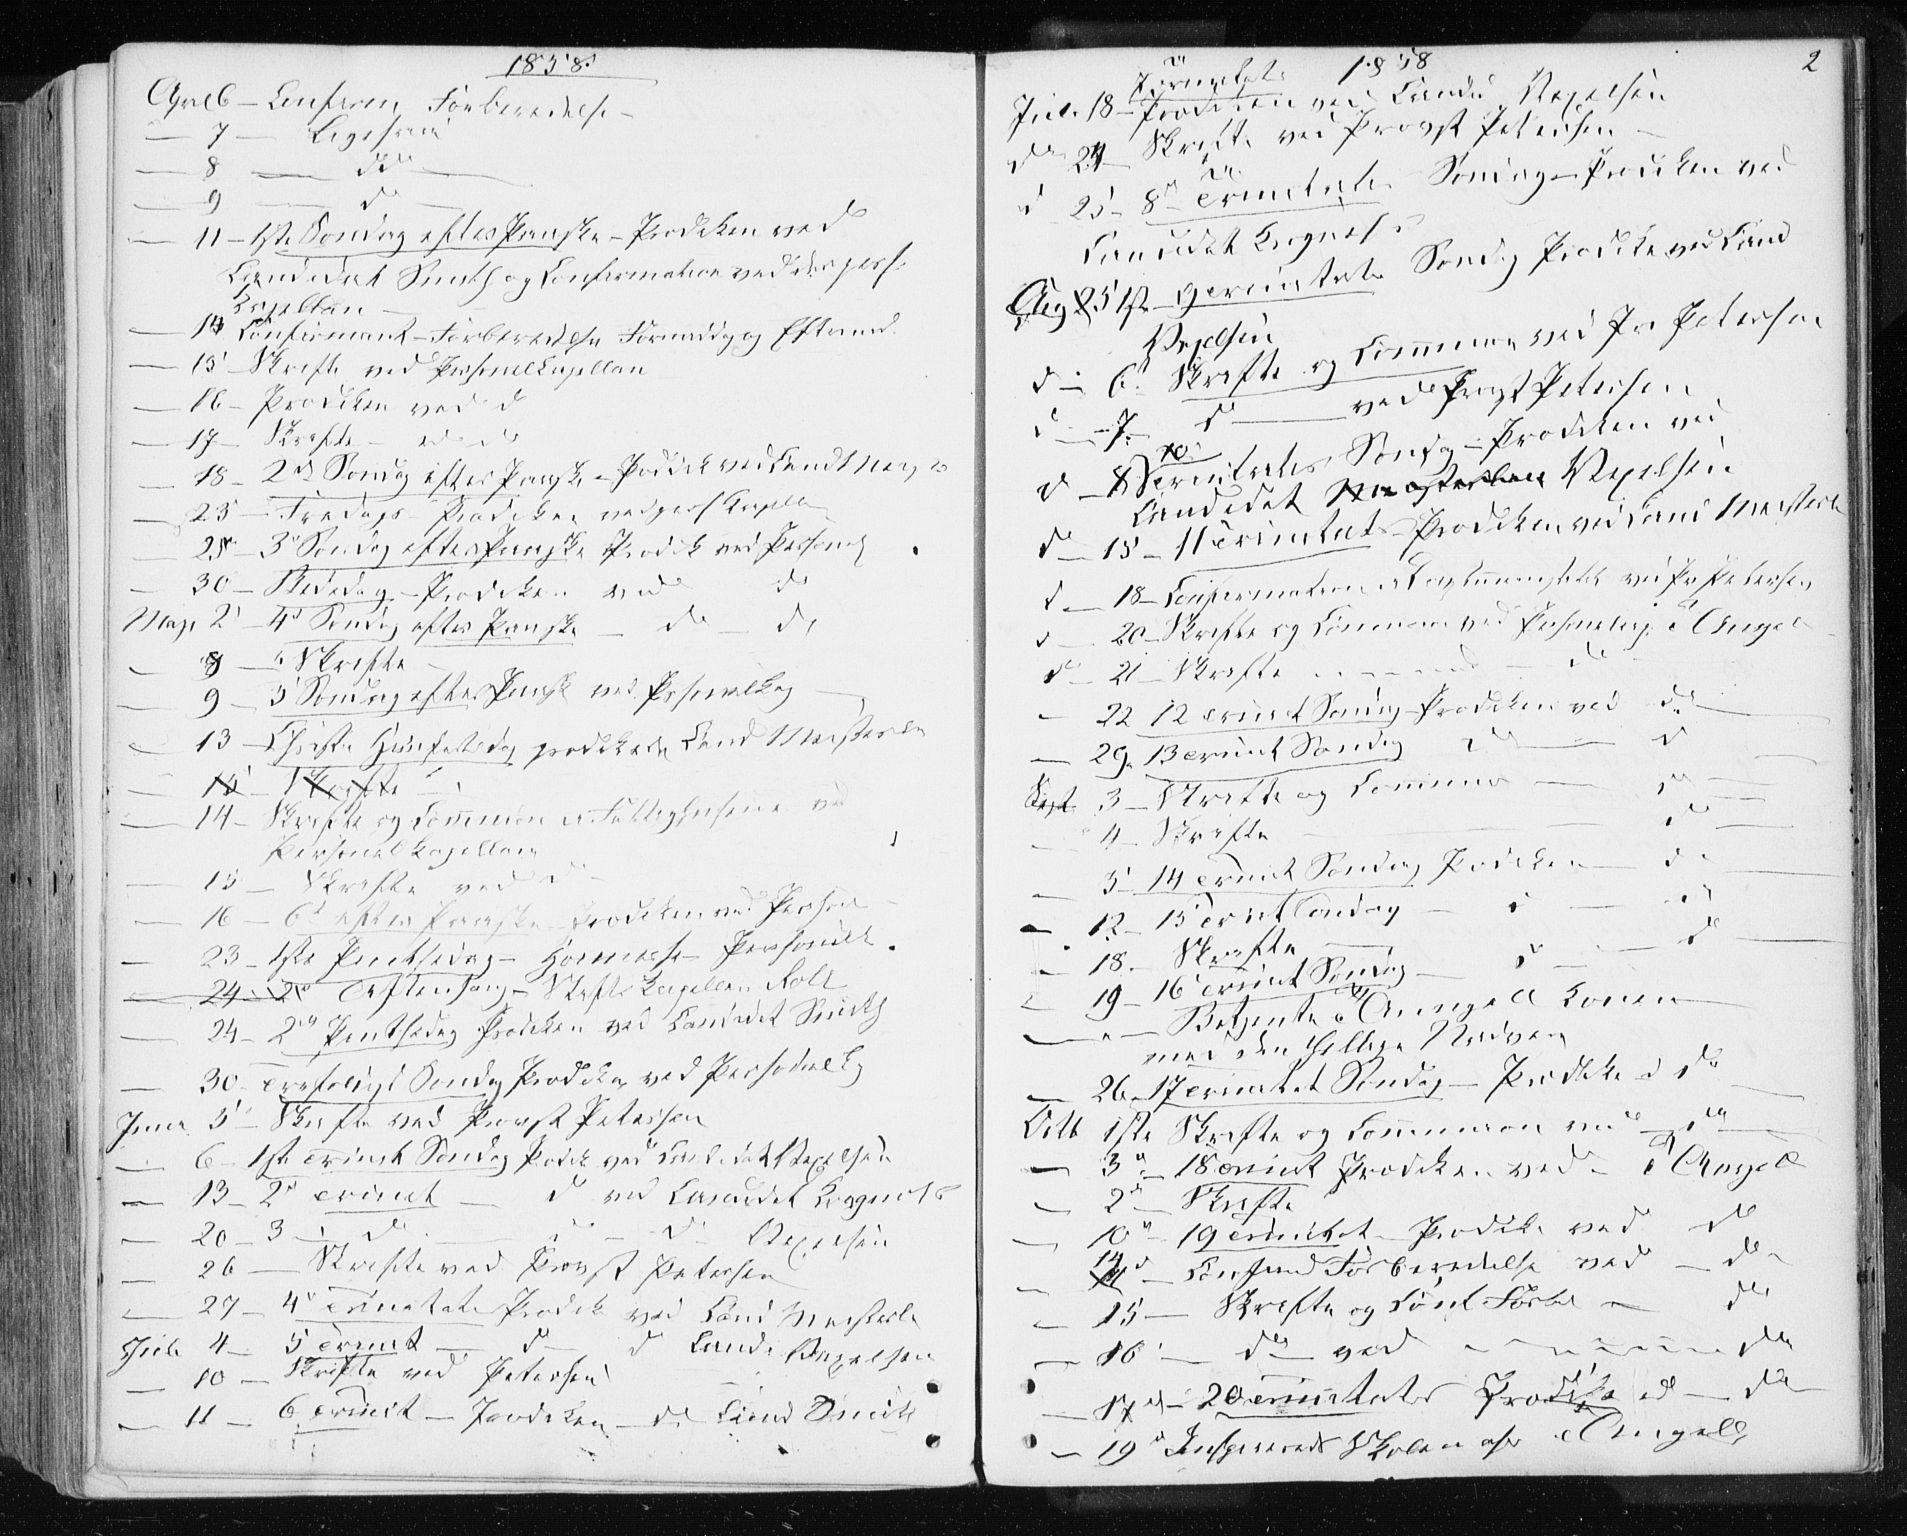 SAT, Ministerialprotokoller, klokkerbøker og fødselsregistre - Sør-Trøndelag, 601/L0053: Parish register (official) no. 601A21, 1857-1865, p. 2